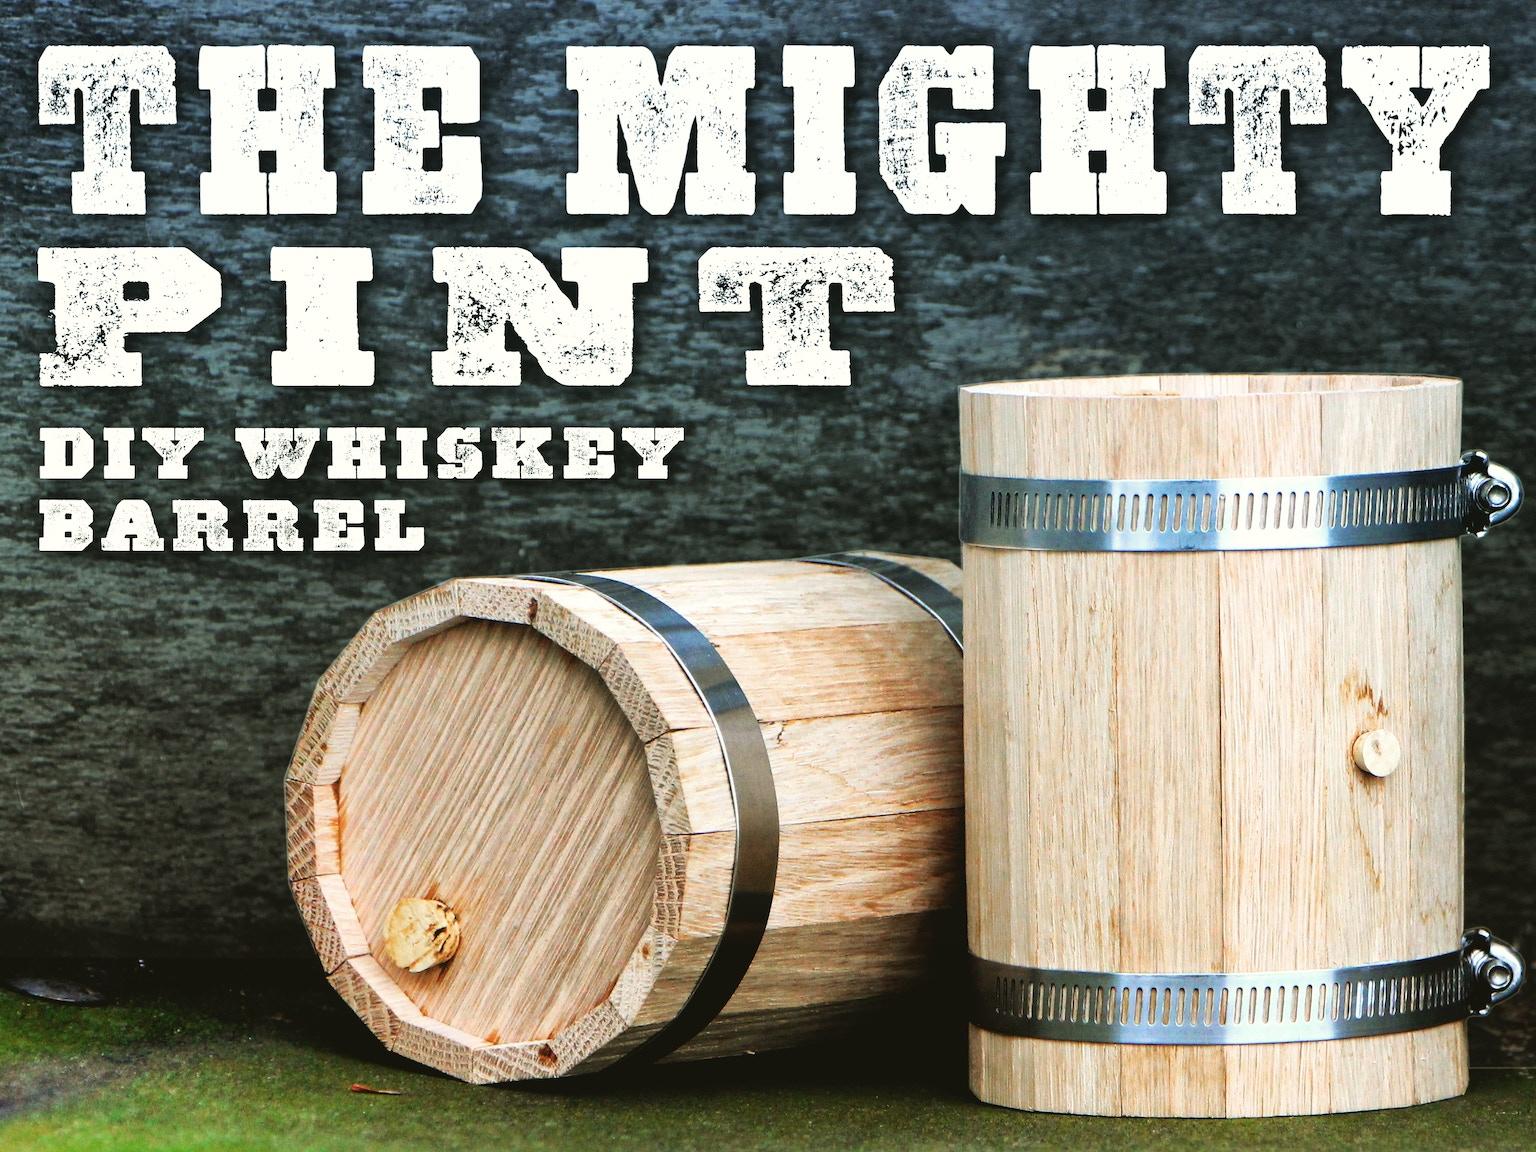 Diy mini whiskey barrel by kyle brown kickstarter for Diy whiskey barrel bar